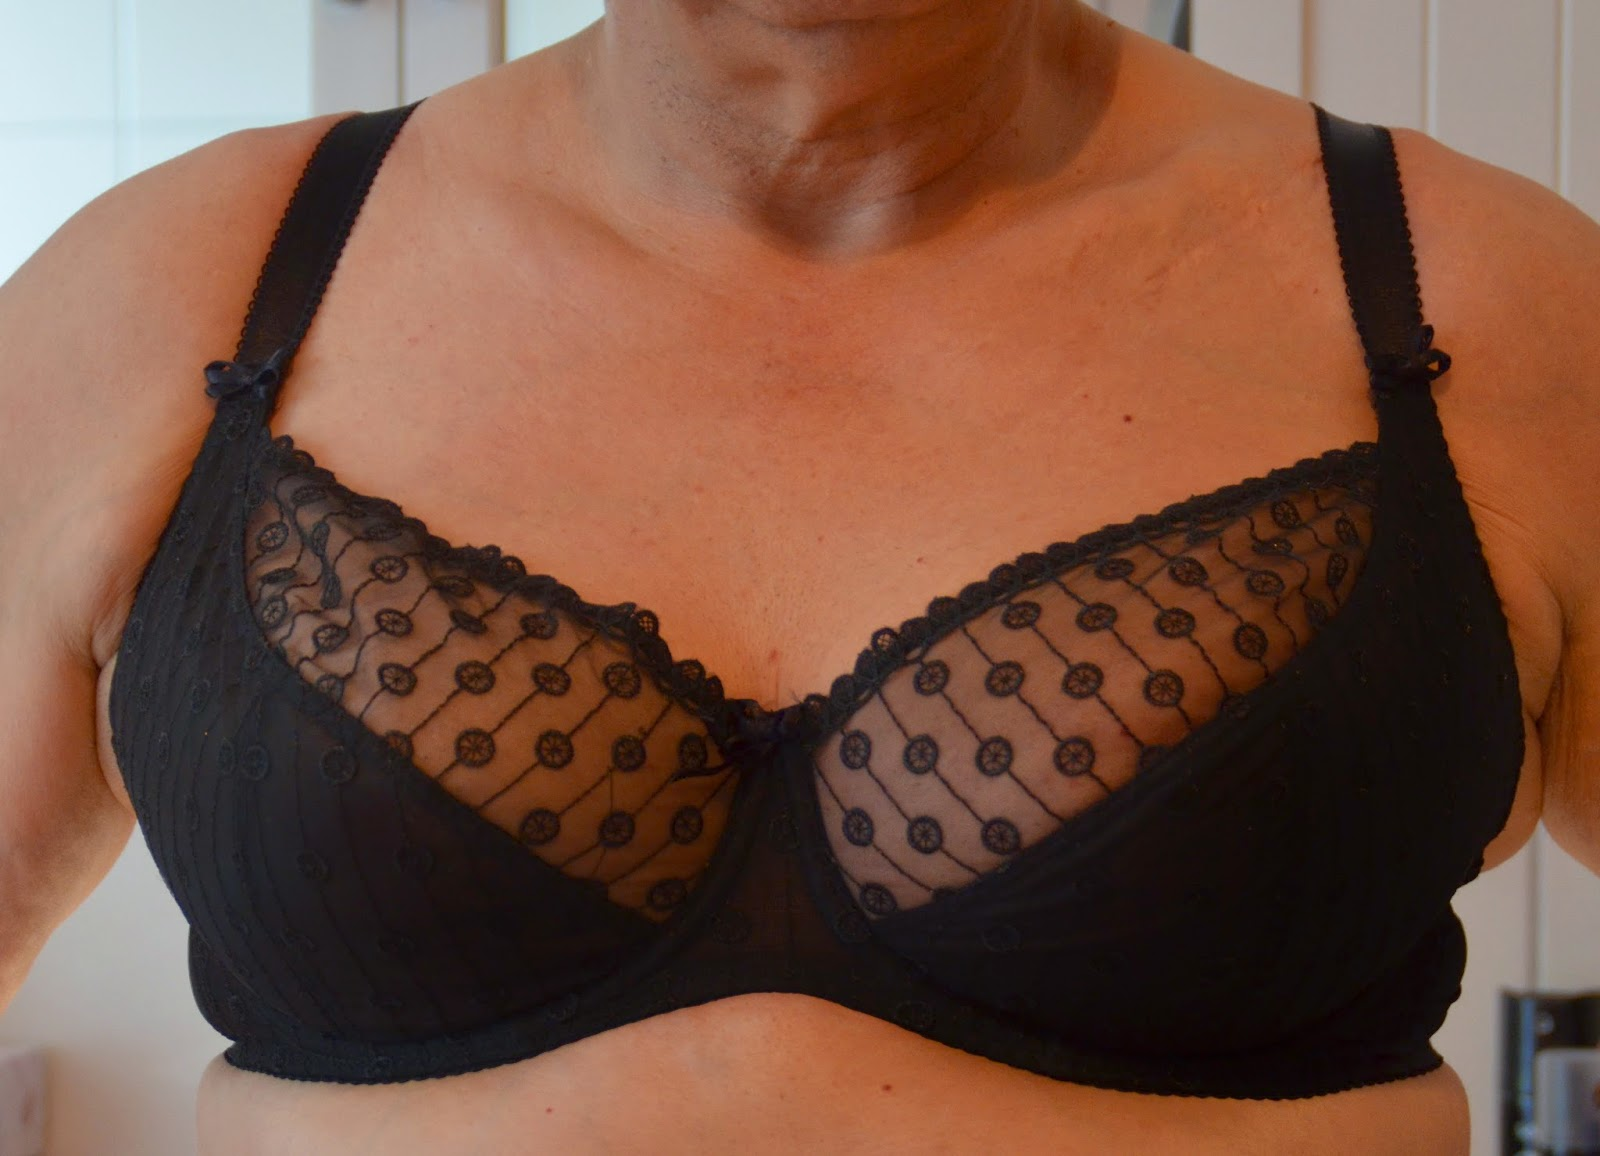 men wearing bras in the summer unnoticed